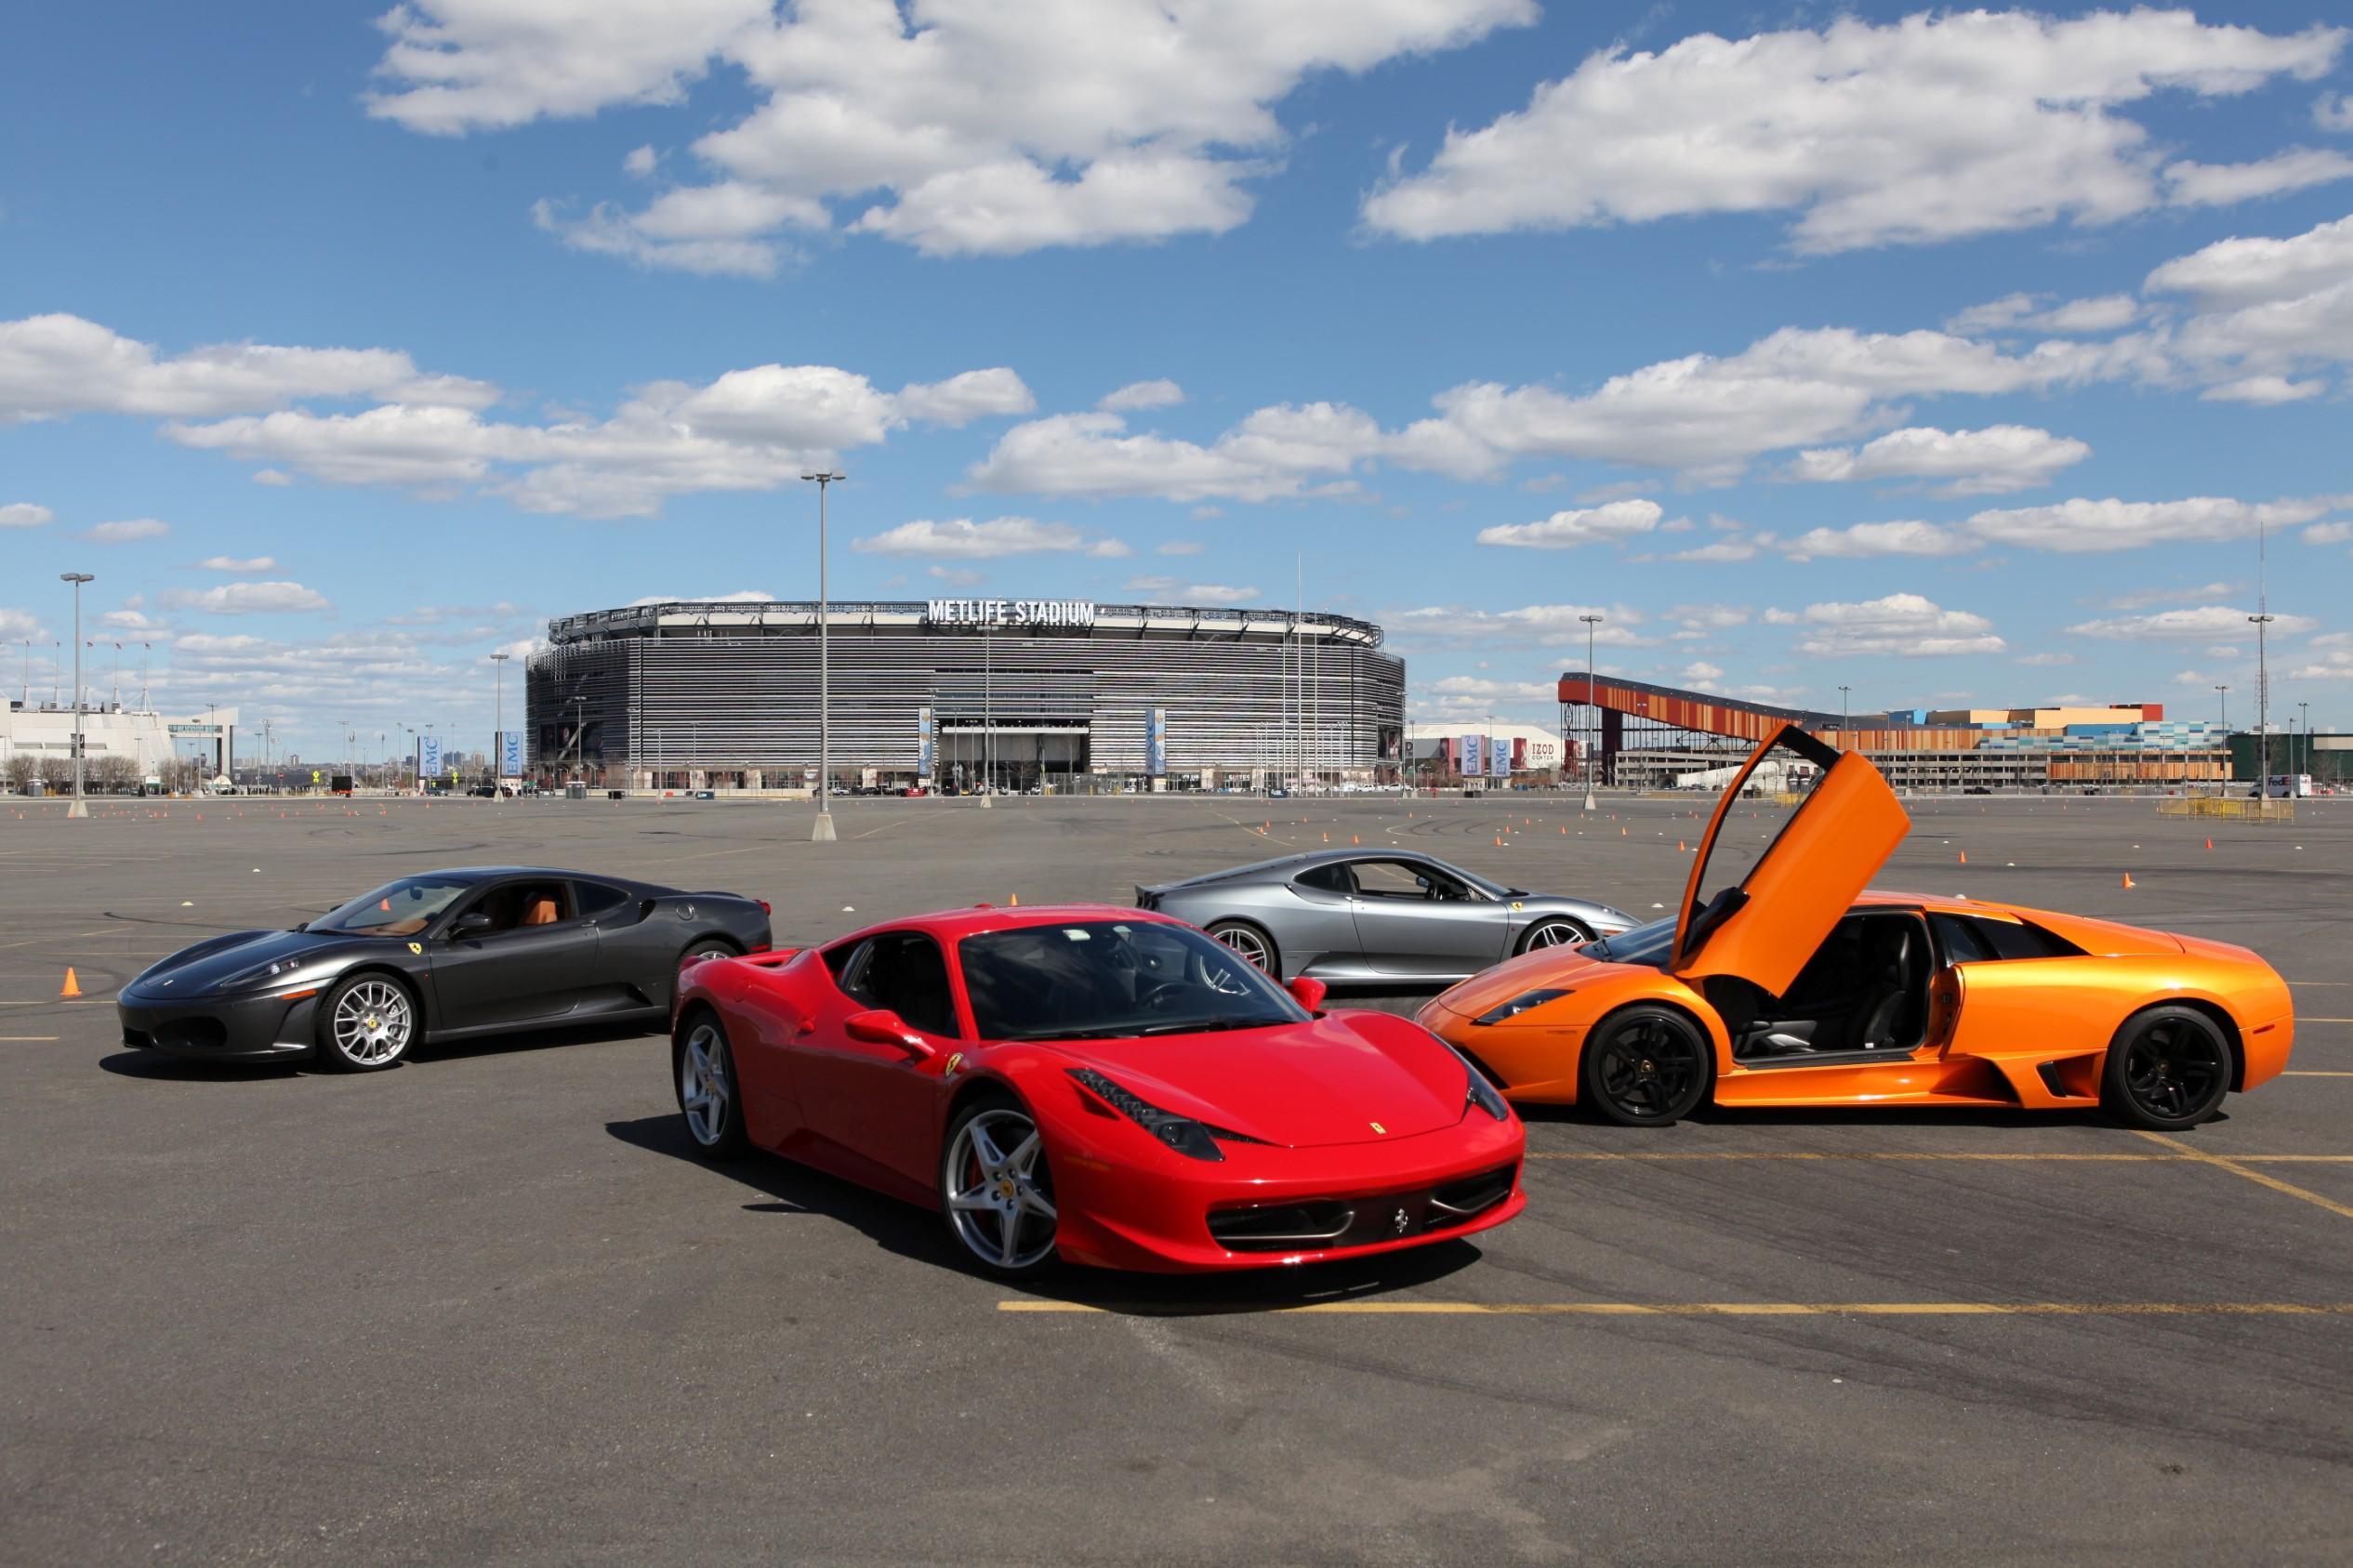 gotham dream cars ferrari  involved  fatal accident